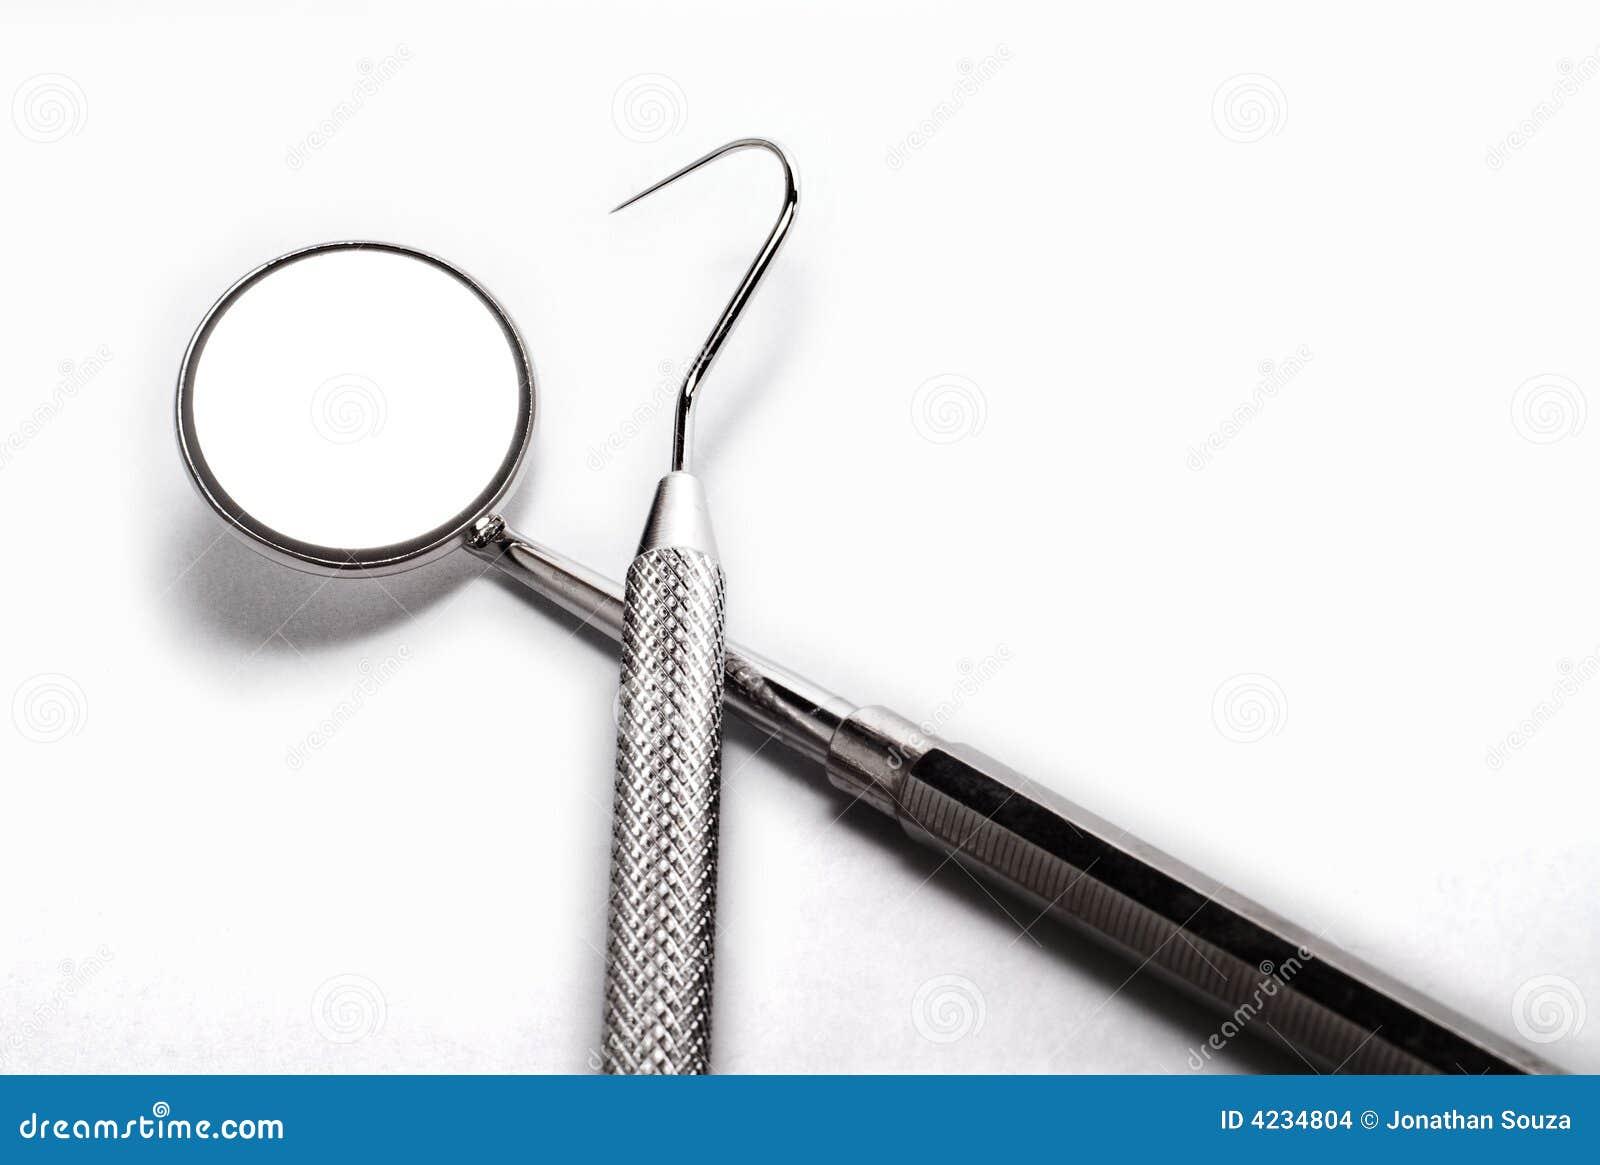 dental hand tools